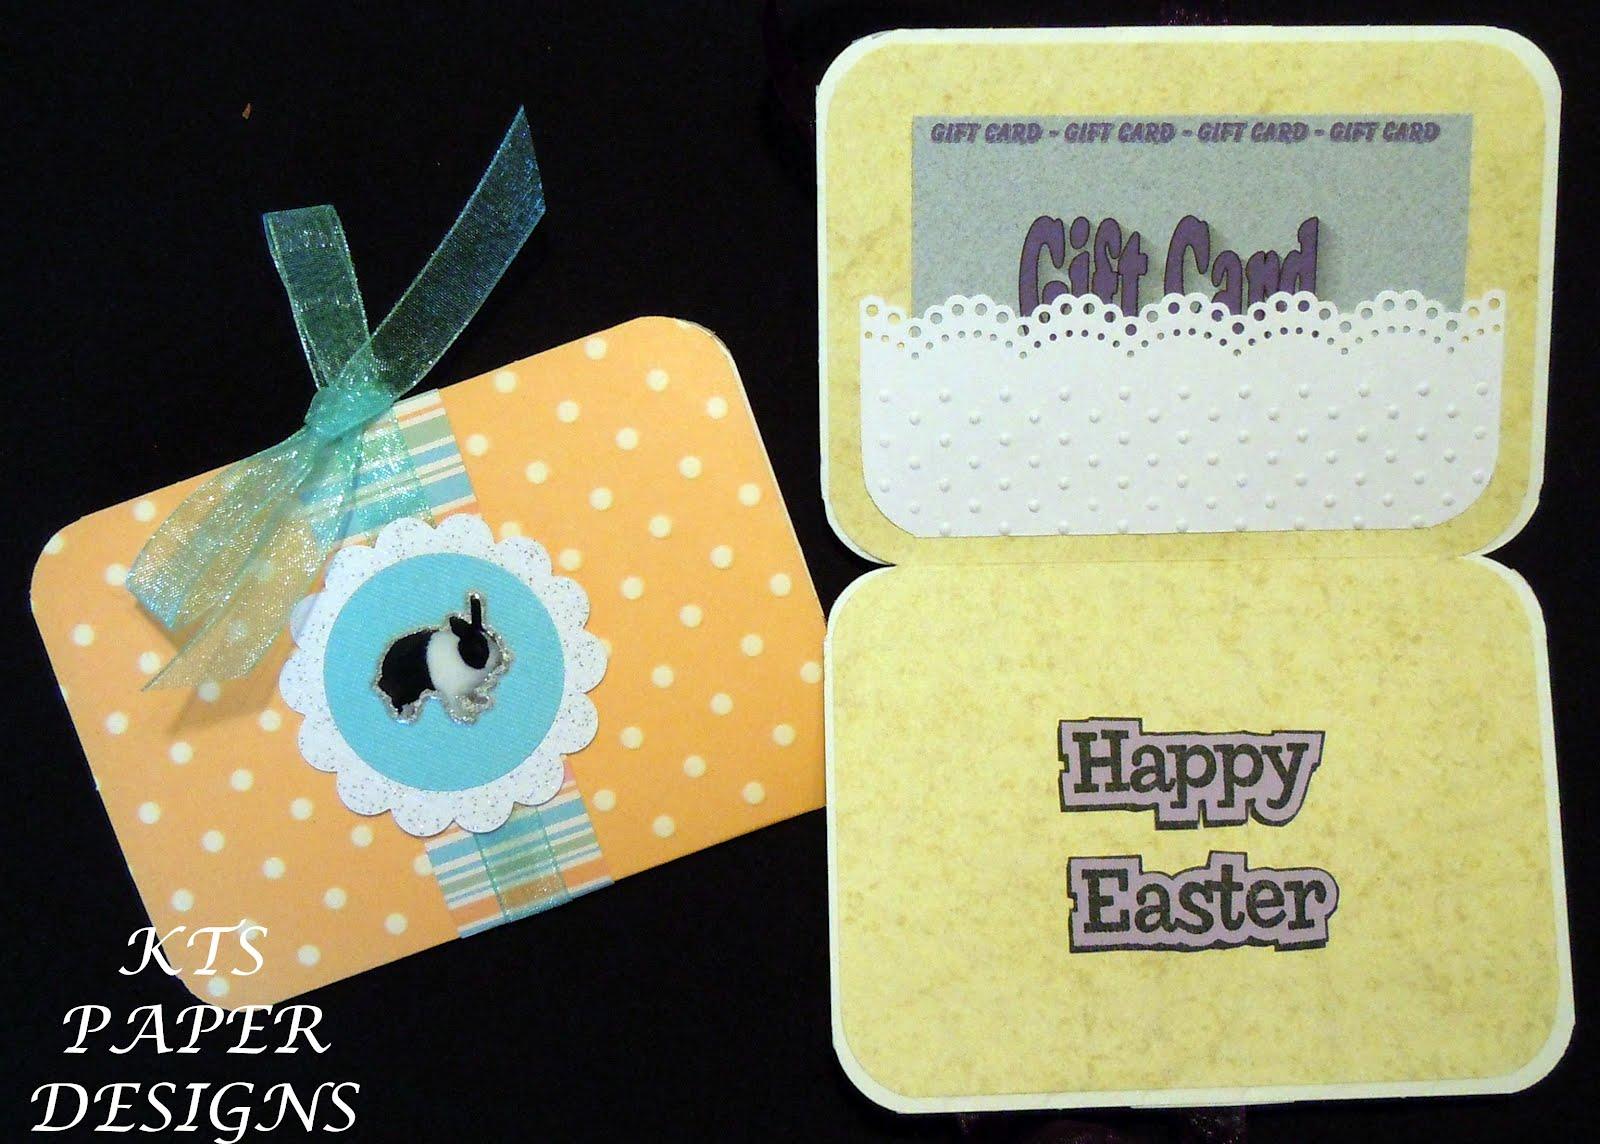 Kts paper designs fold open easter gift card holders fold open easter gift card holders negle Gallery